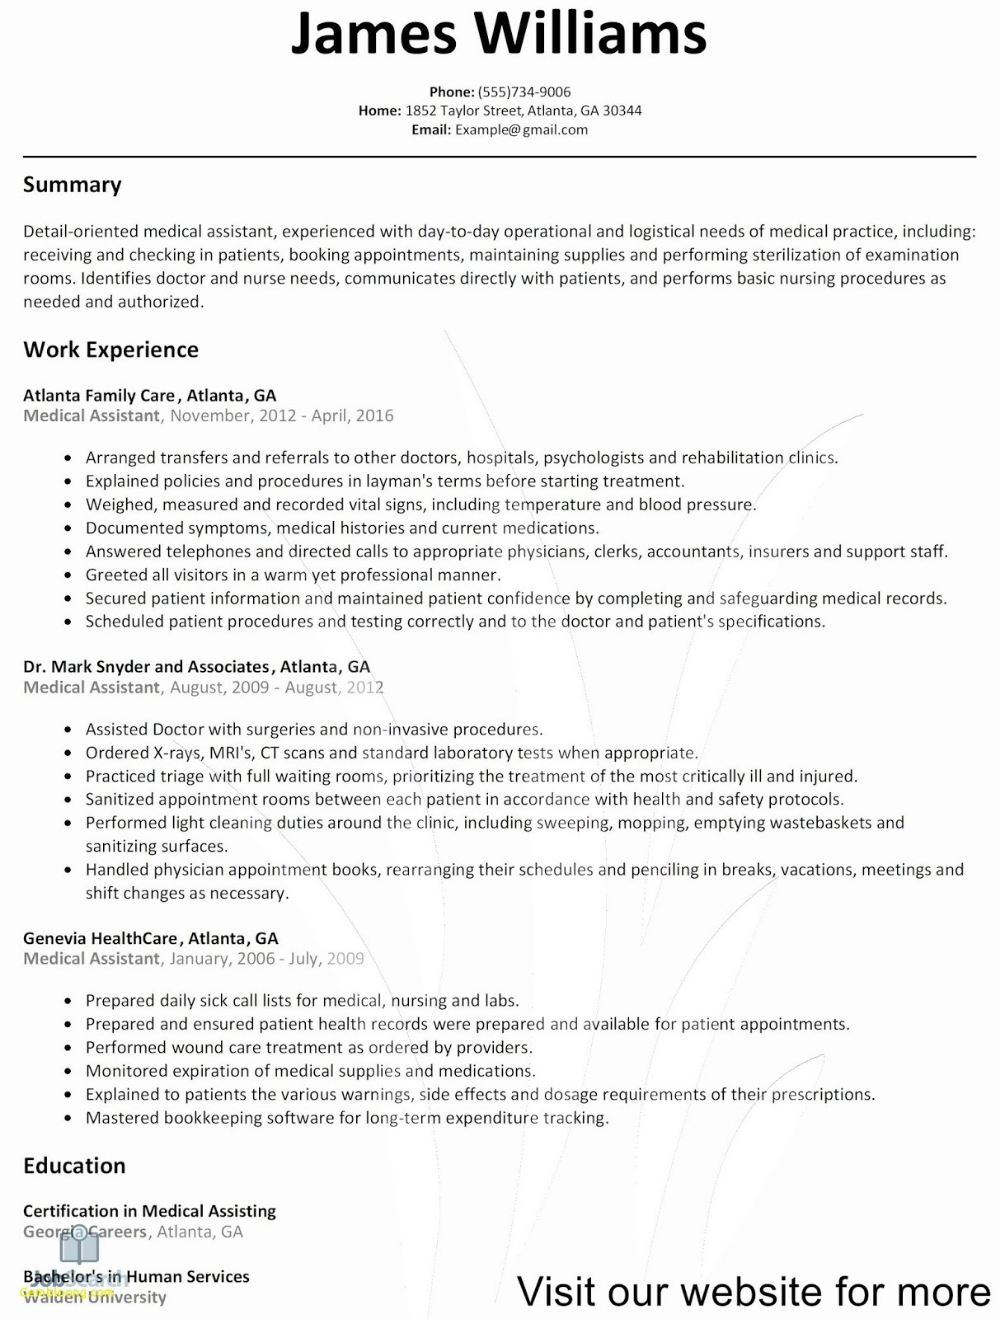 Healthcare Resume Templates 2020 healthcare resume